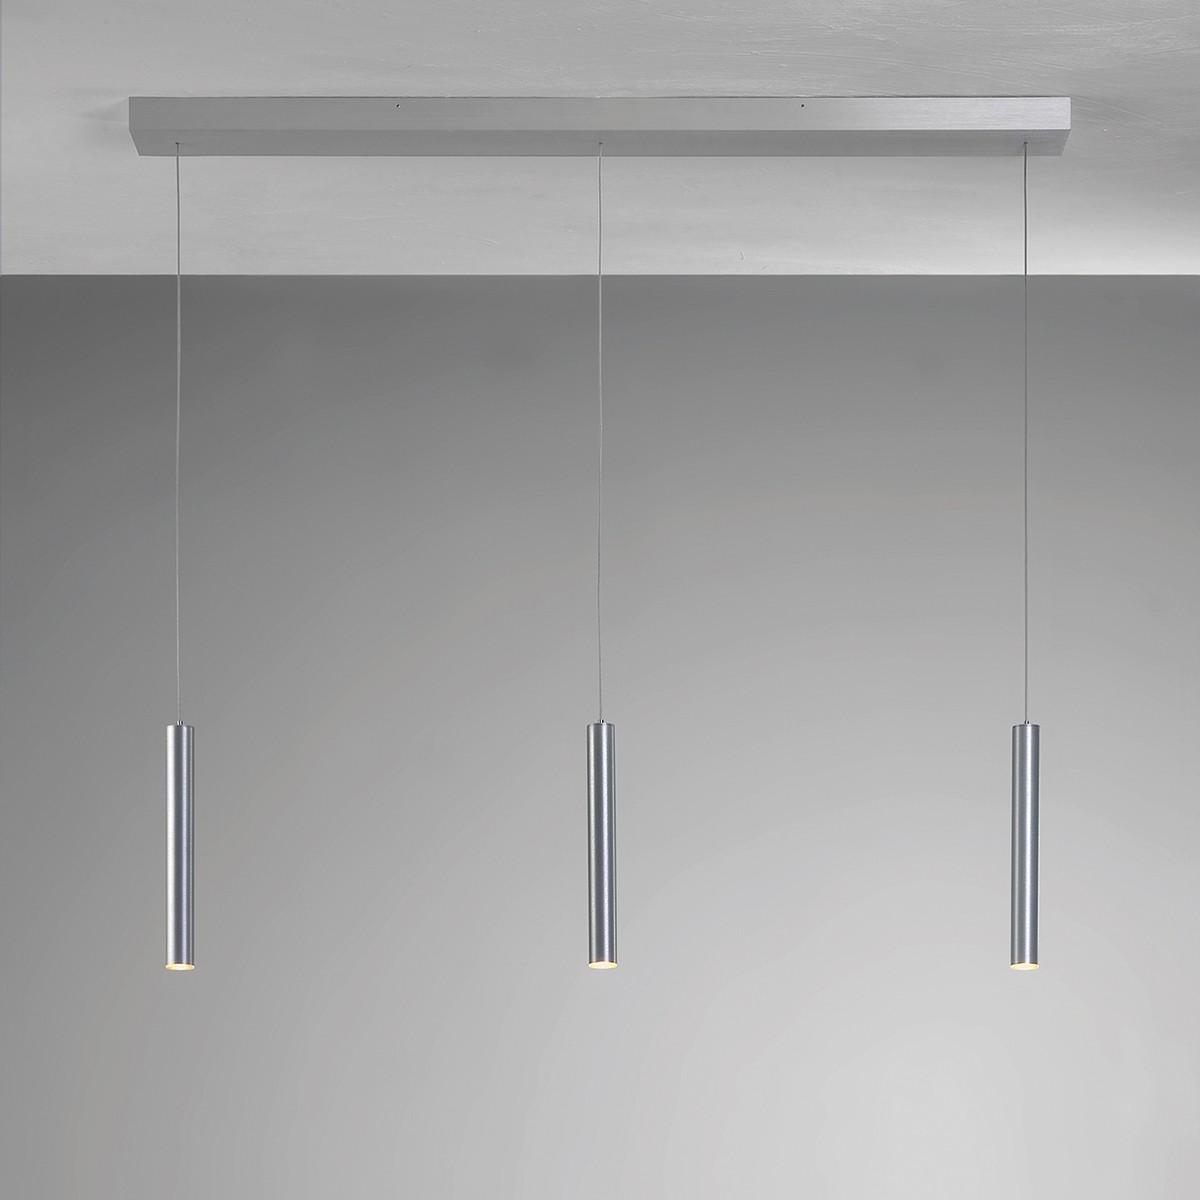 Bopp Plus LED Pendelleuchte, 3-flg., mit Casambi Modul, Aluminium geschliffen